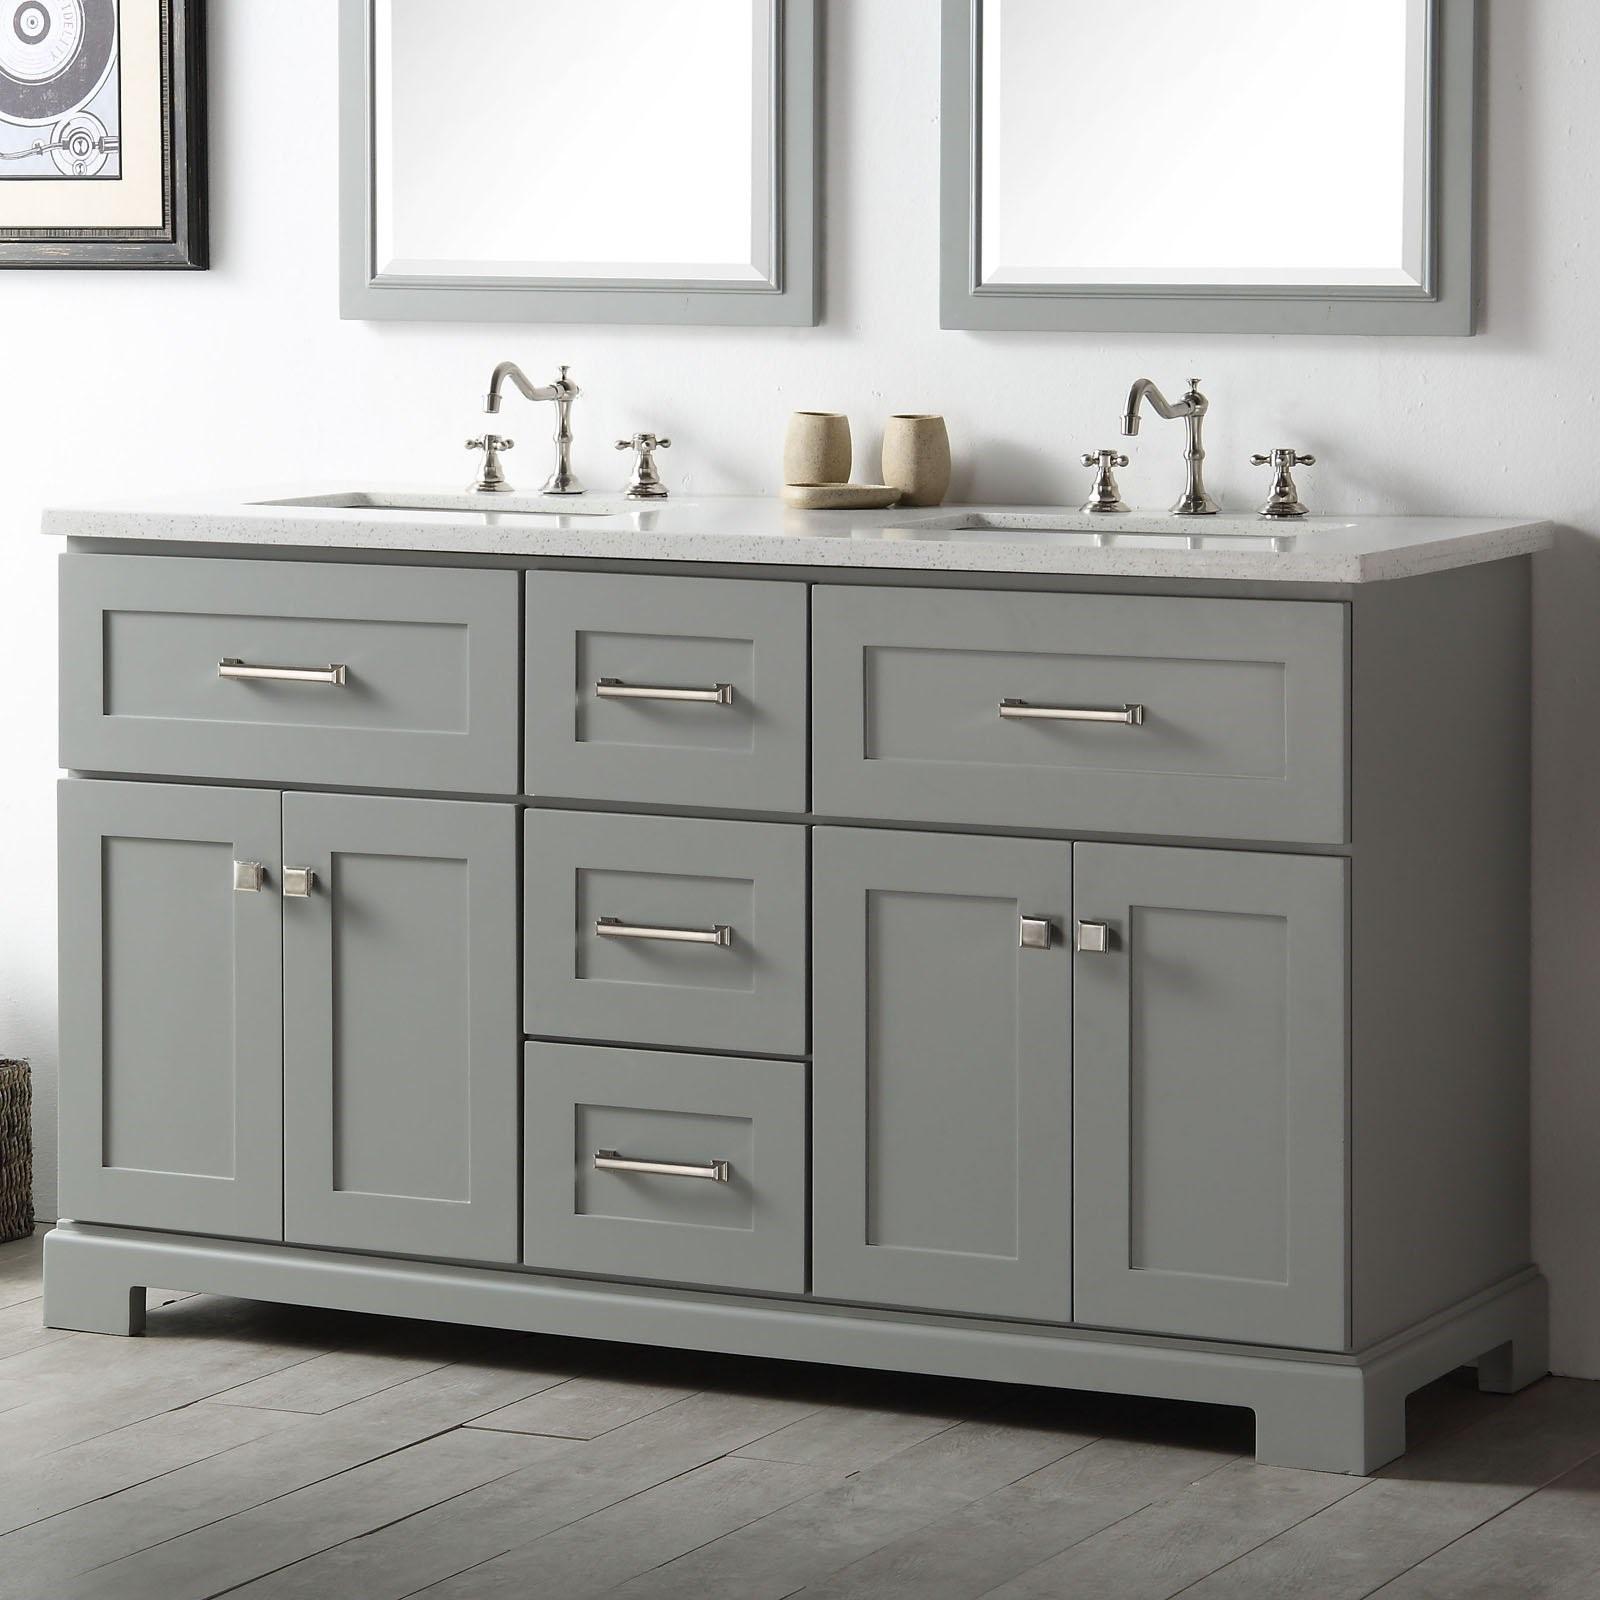 Modern Luxury Customized Furniture Shaker Style Bathroom Vanity Buy Luxury Customized Solid Wood Vanity Modern Furniture Bathroom Vanities Shaker Style Bathroom Vanity Product On Alibaba Com